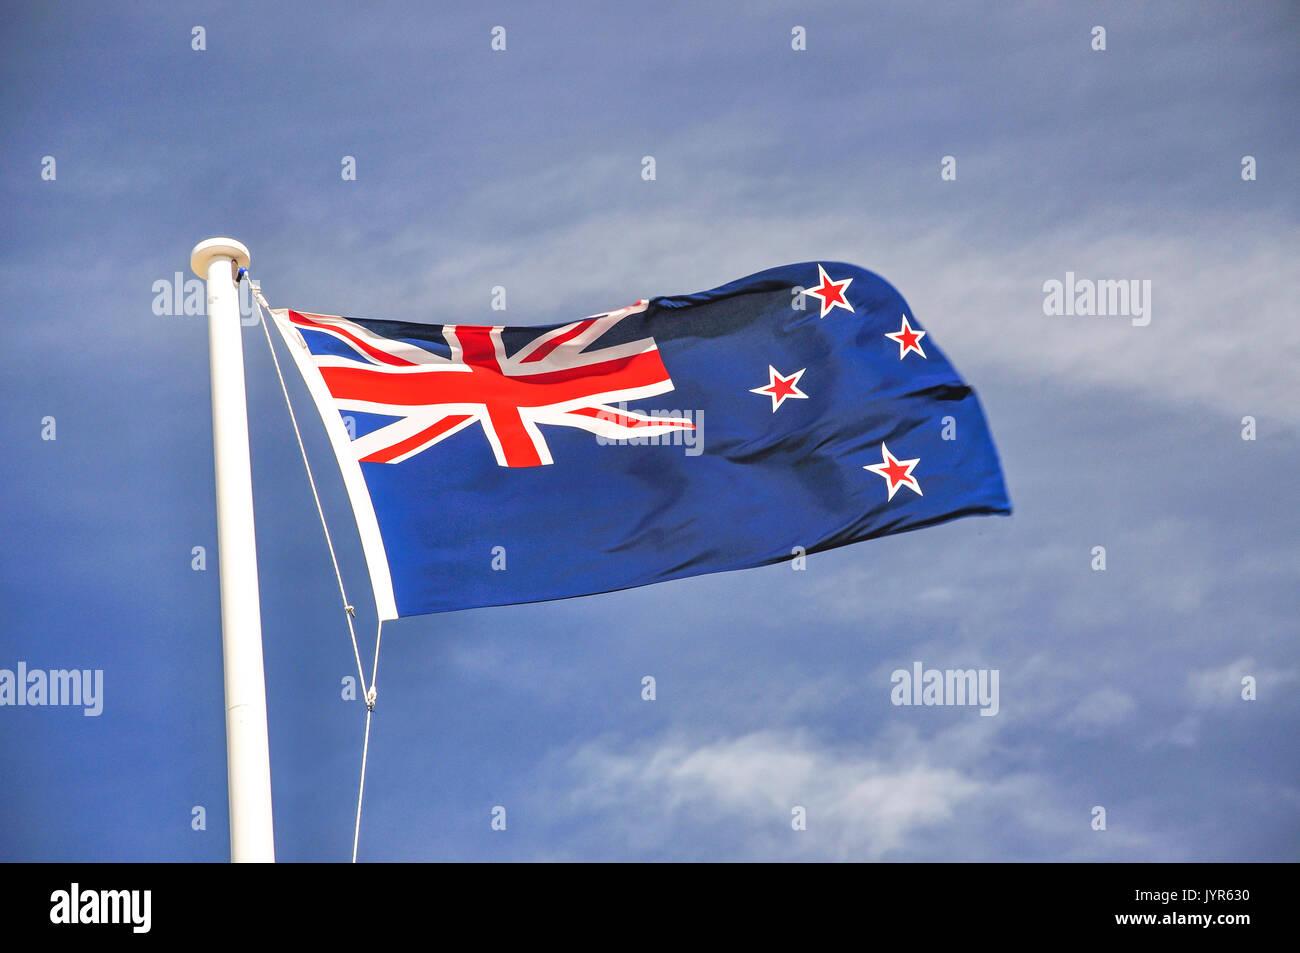 New Zealand flag, The Museum of New Zealand Te Papa Tongarewa, Cable Street, Wellington, Wellington Region, New Zealand - Stock Image